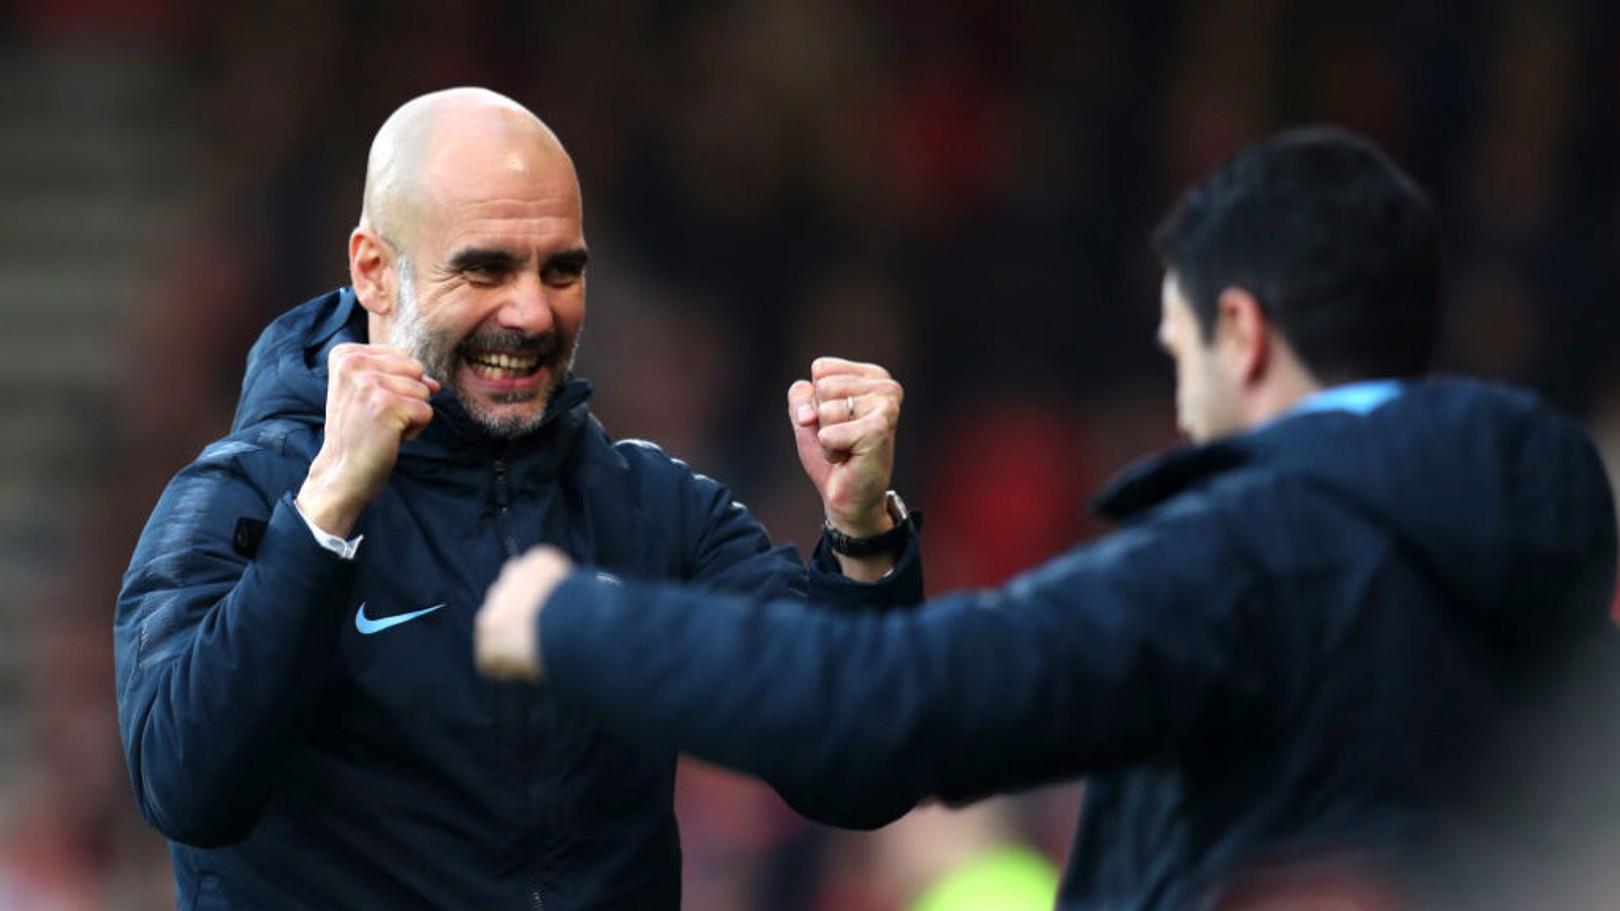 SMILES BETTER: Pep Guardiola celebrates our opener with Mikel Arteta